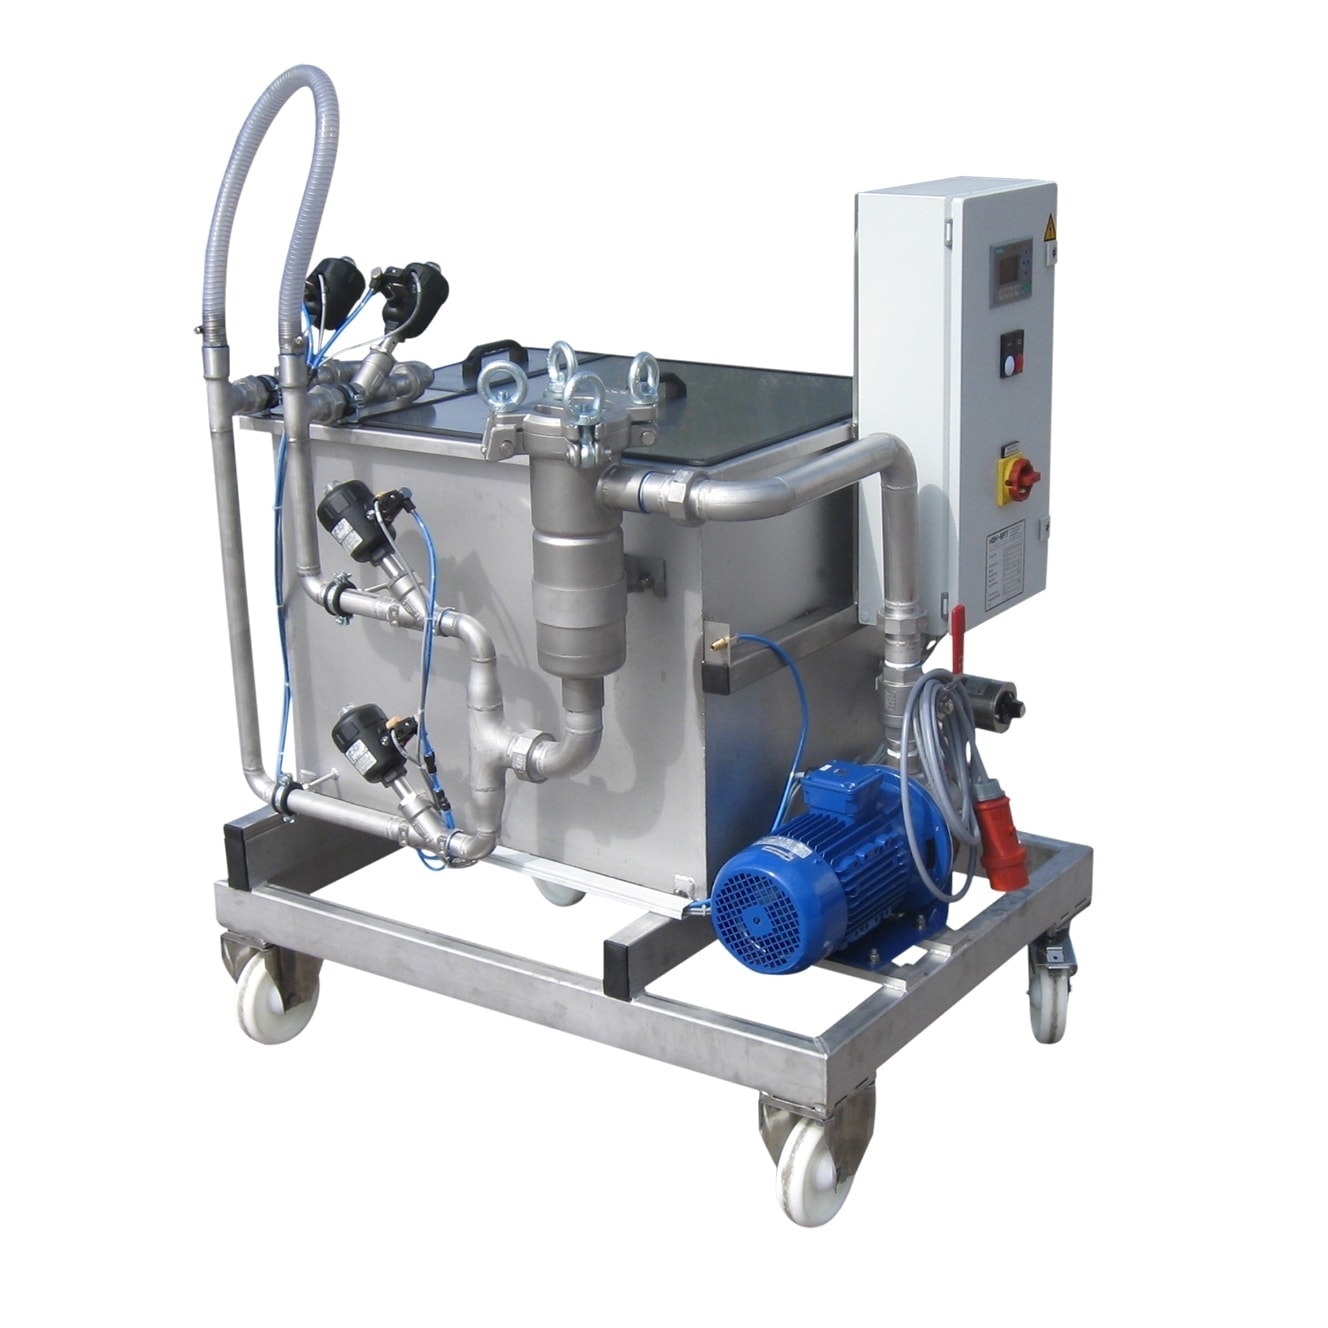 Entkalkungsgerät. Ölkühlerreinigungsgeräte